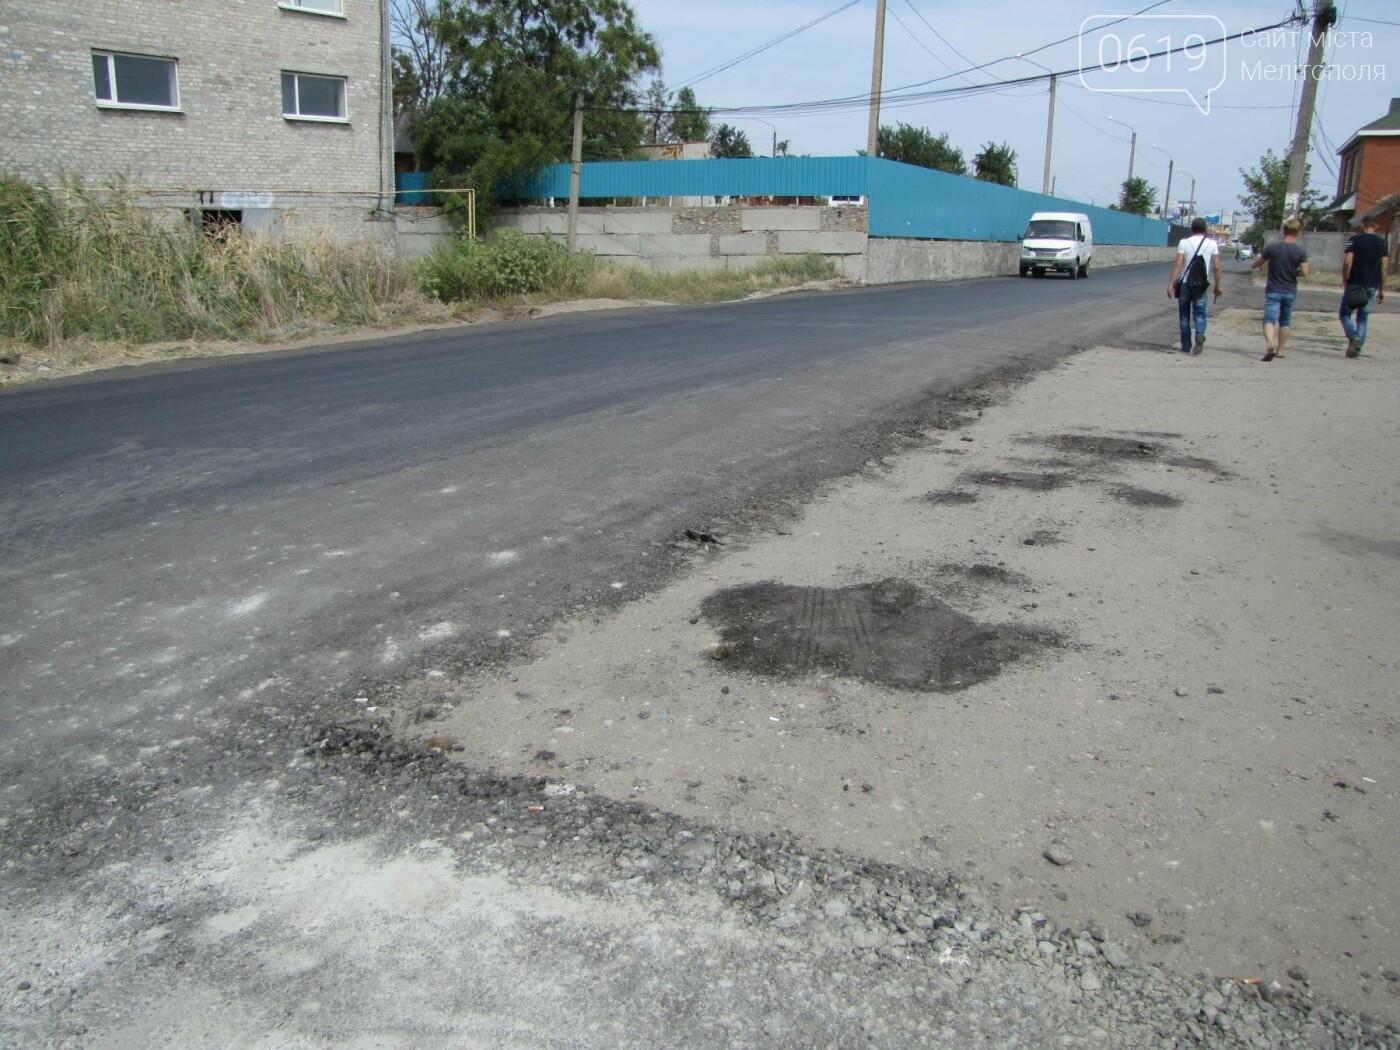 В Мелитополе отремонтировали дорогу на окраине, фото-6, Фото сайта 0619